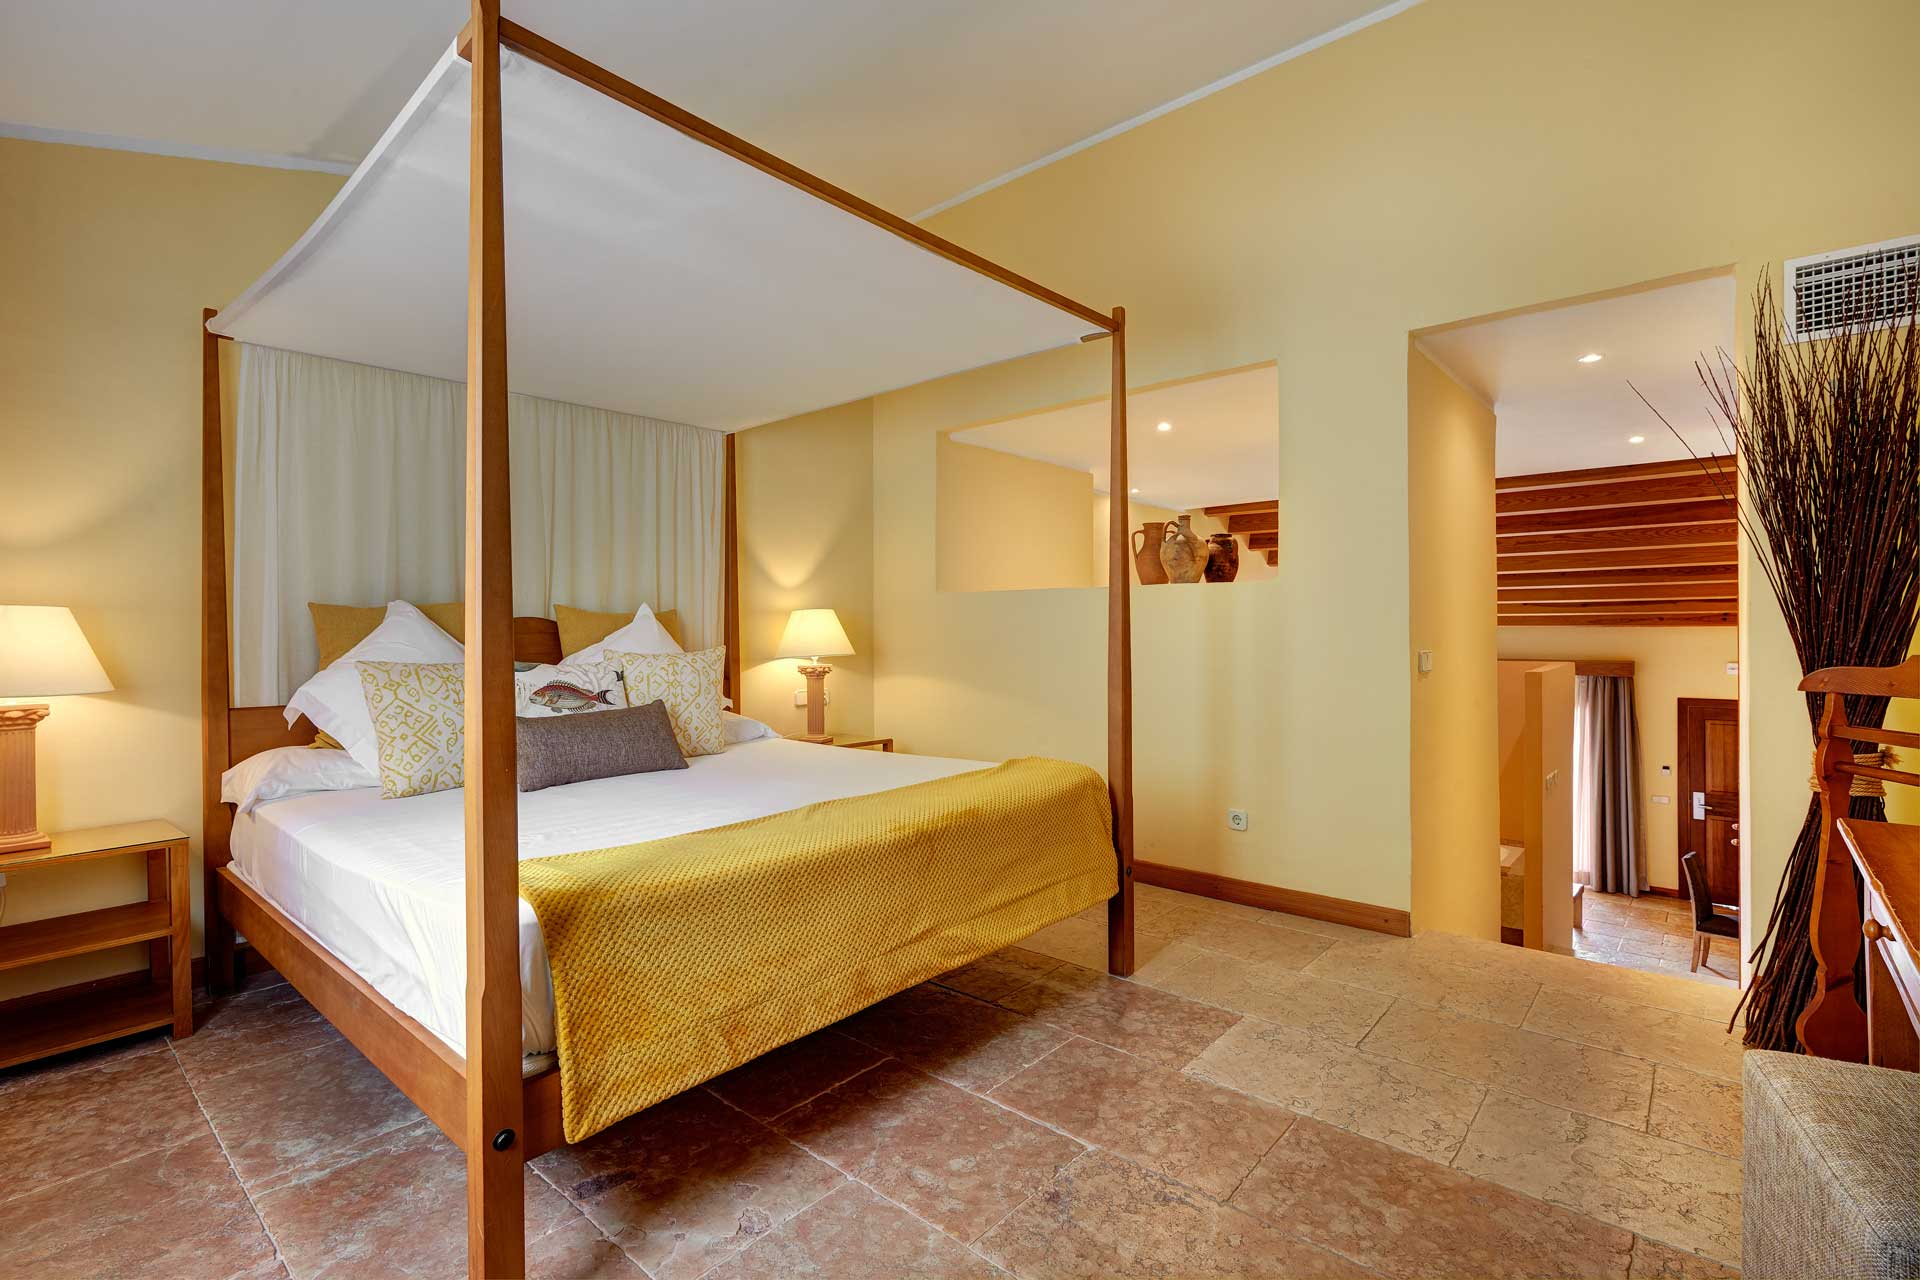 Finca-Hotel Sentido Pula Suites - Standard Suite